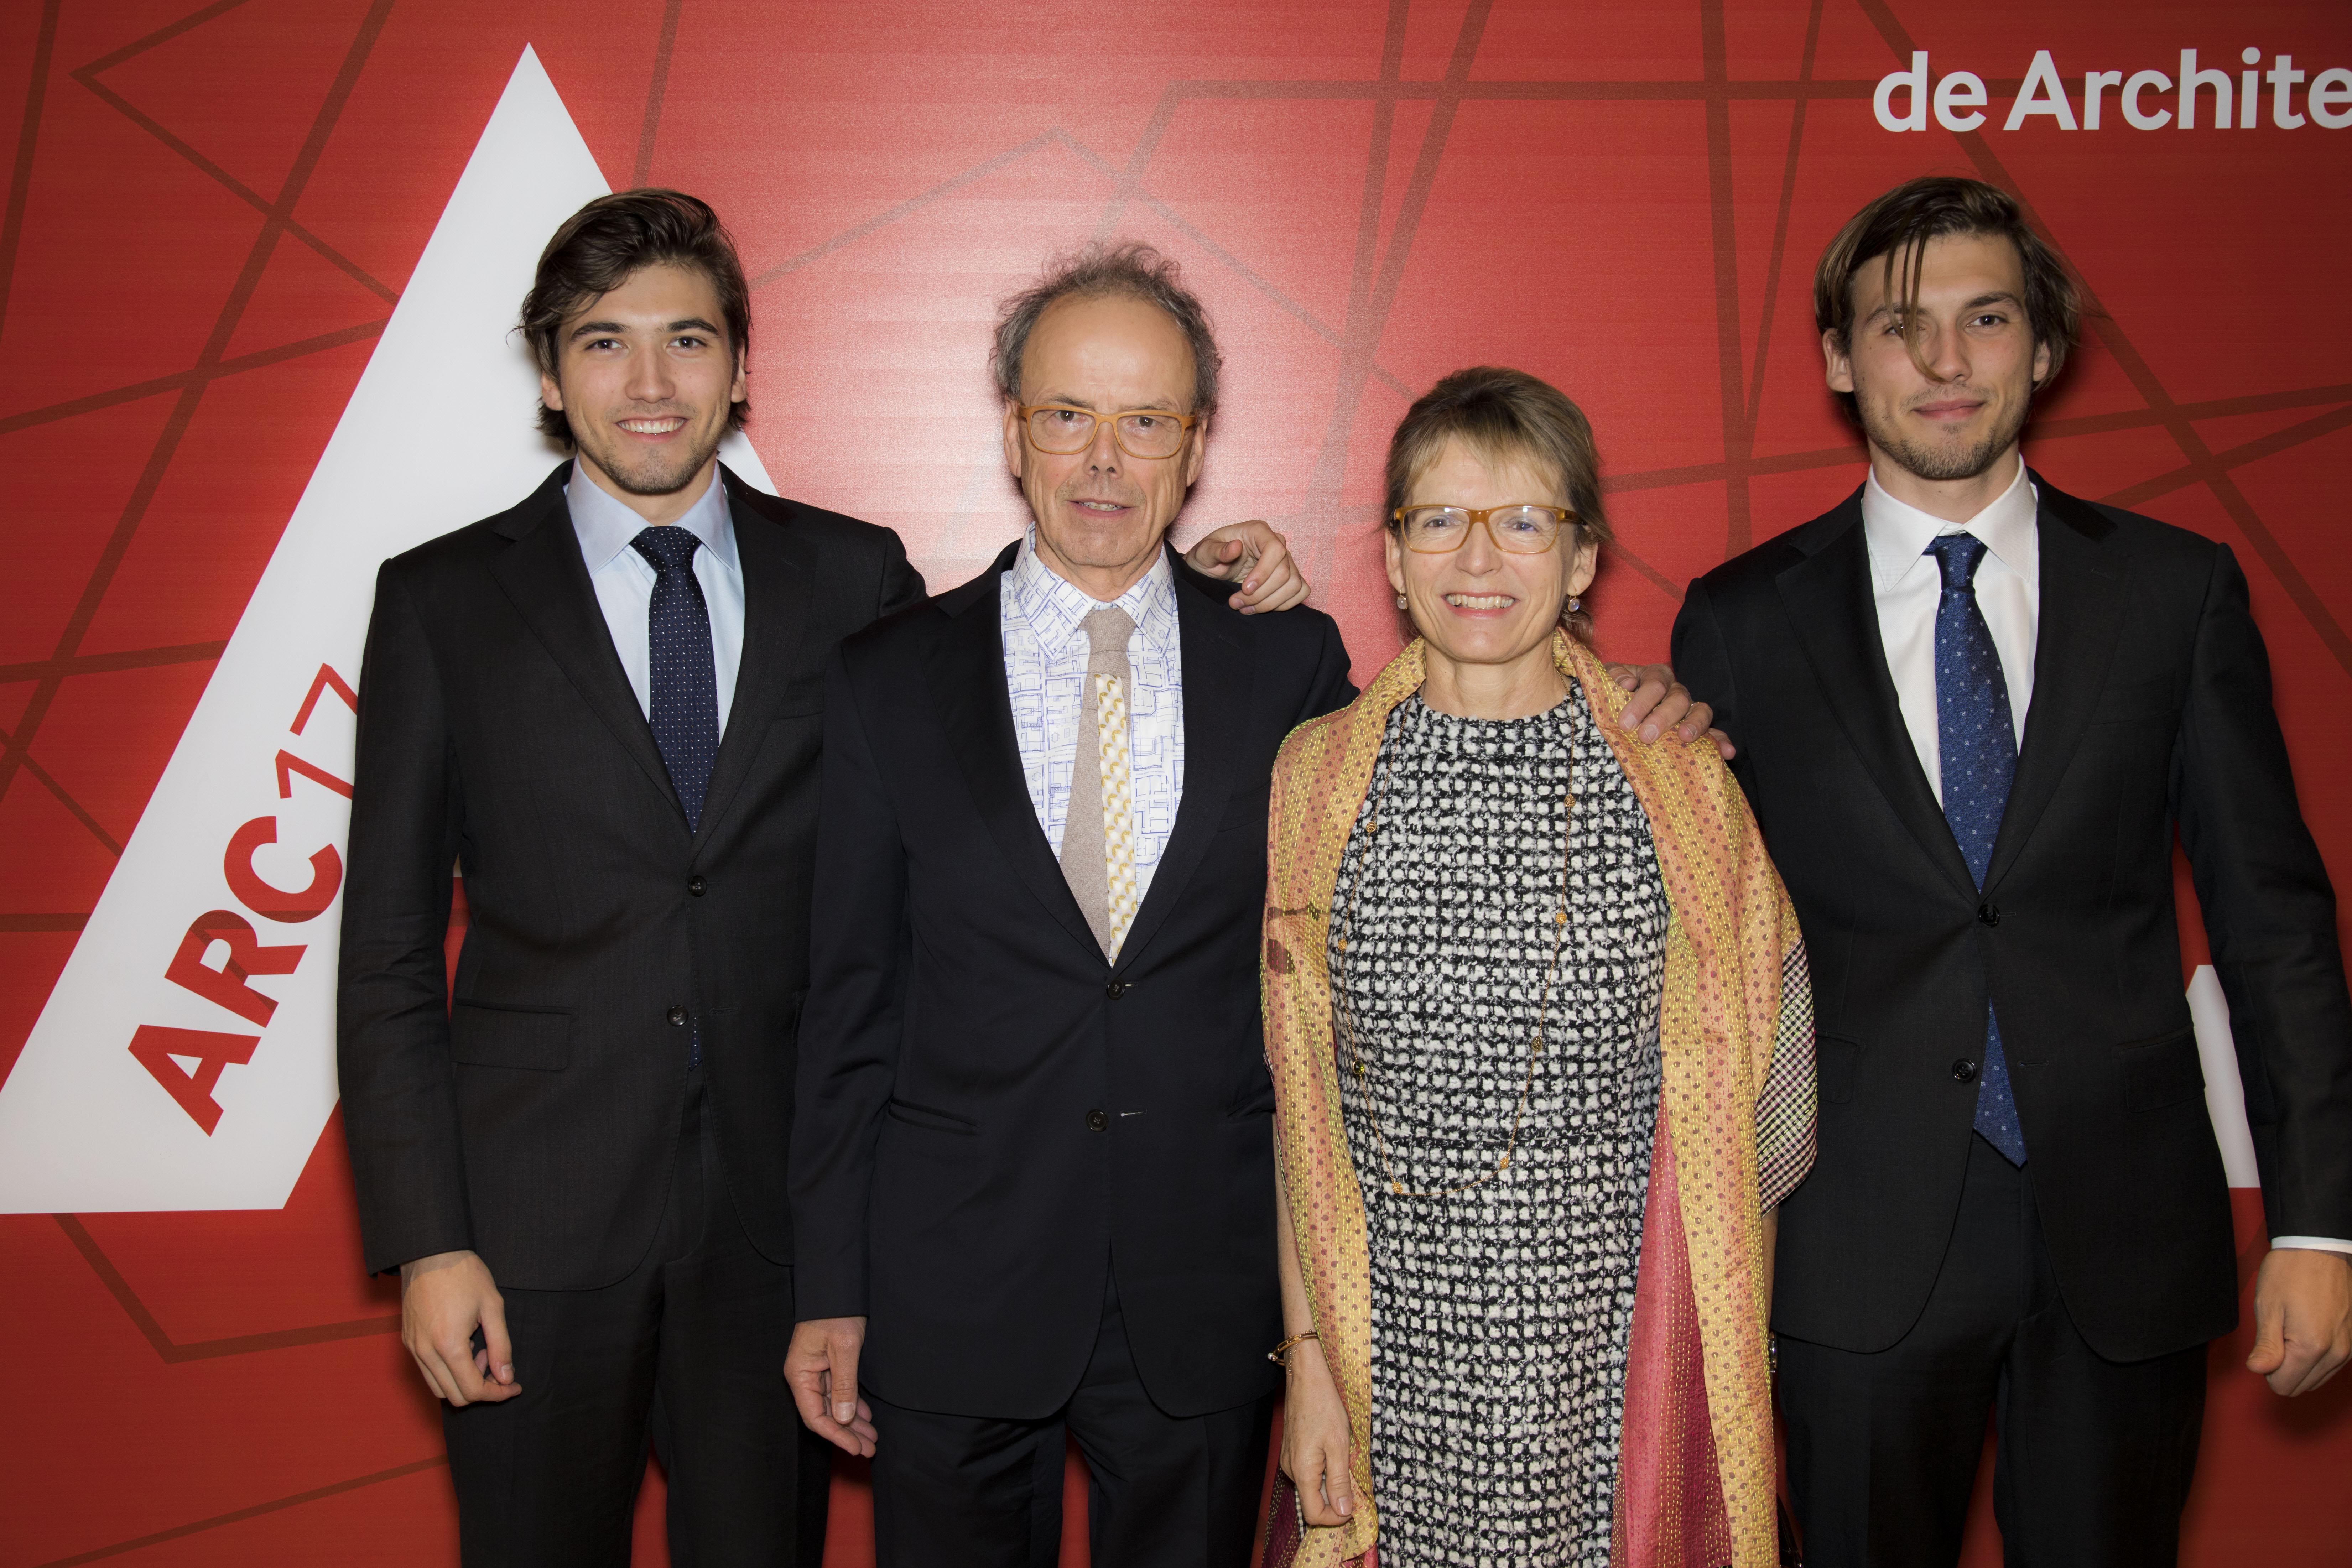 <p>Kees Christiaanse, winnaar van de ARC17 Oeuvre Award met familie. Foto: Elvins Fotografie</p>